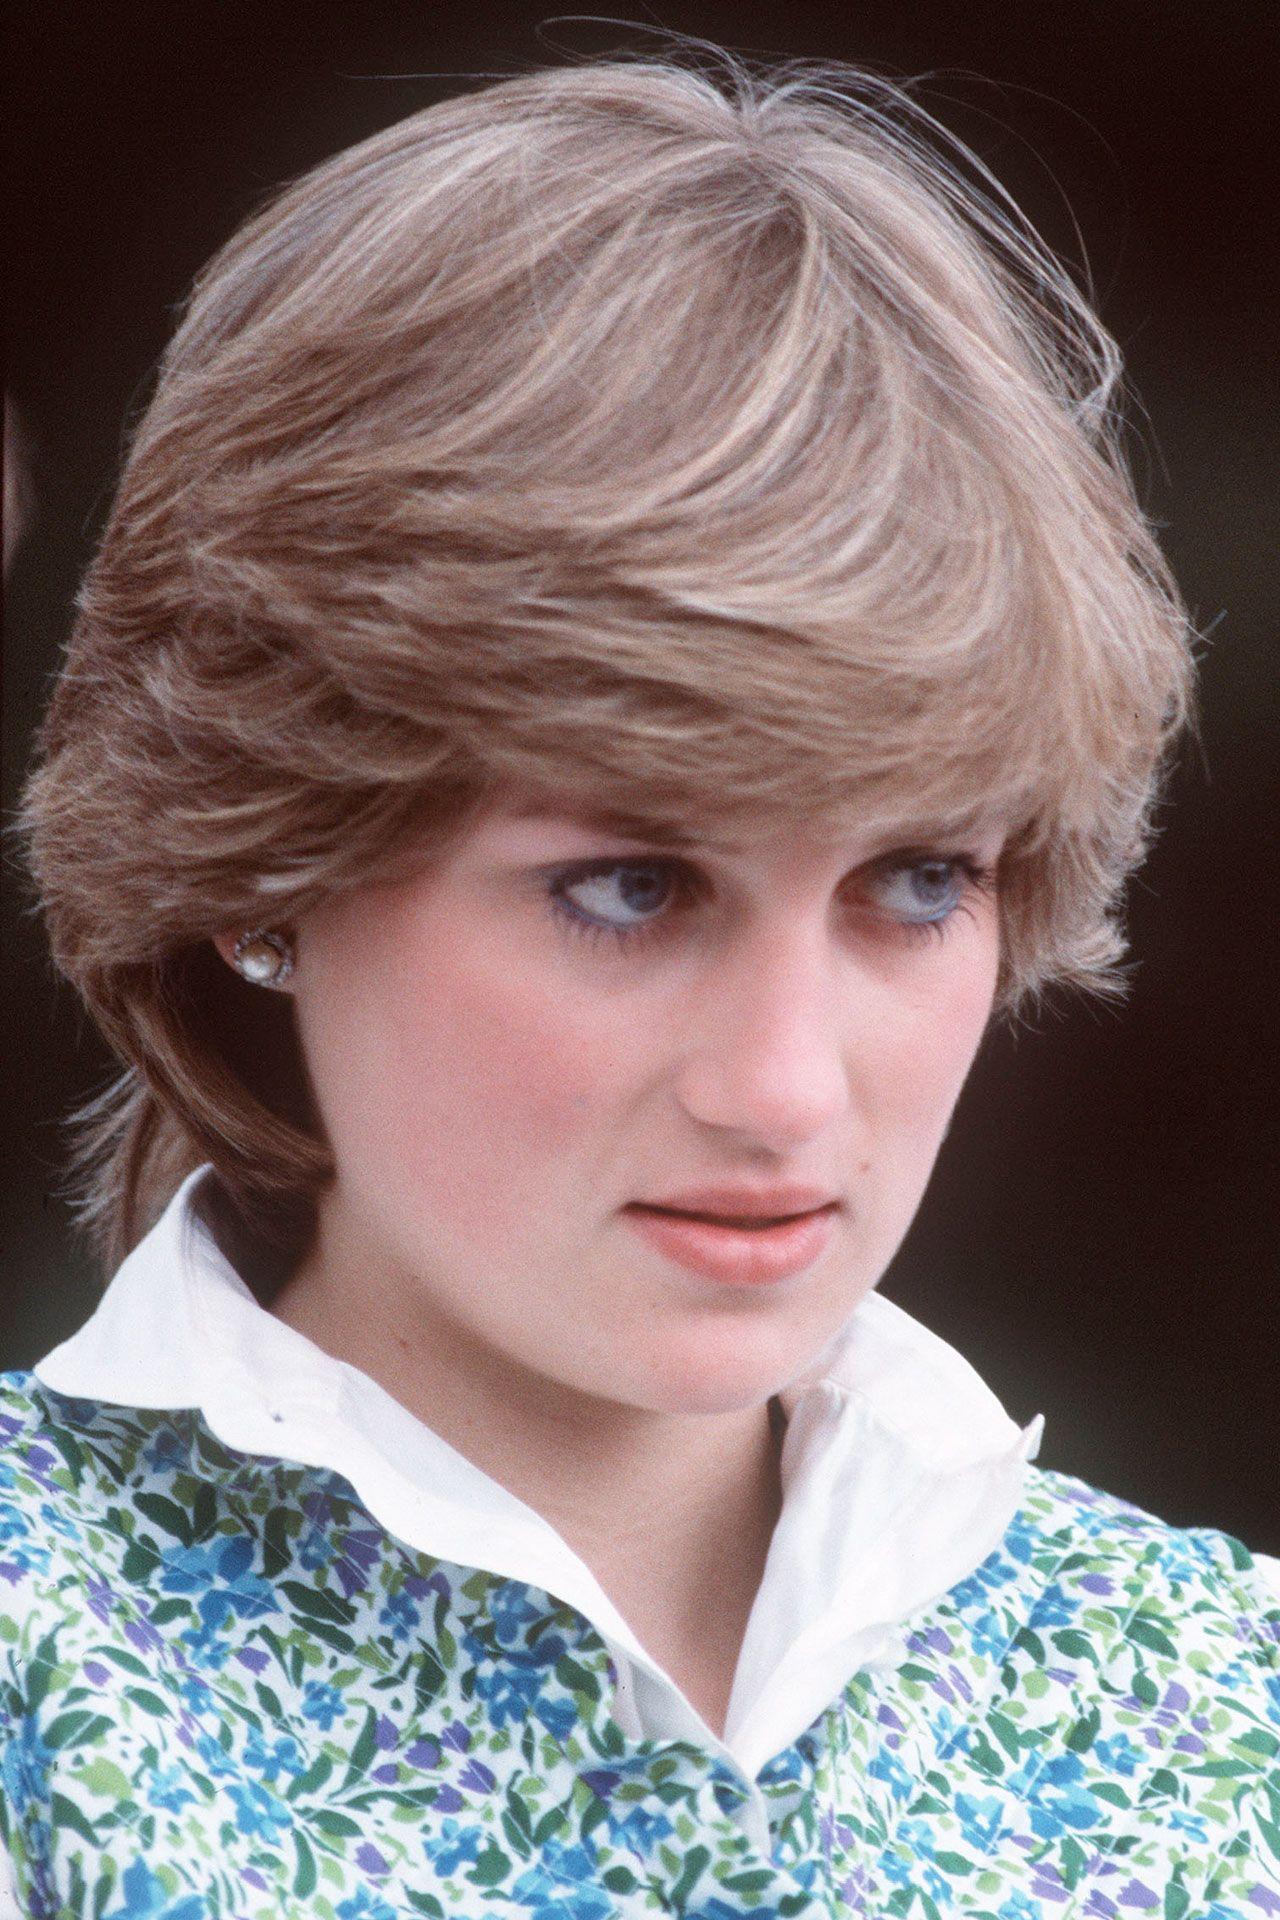 Princess Diana Her Life In Pictures Princess diana hair